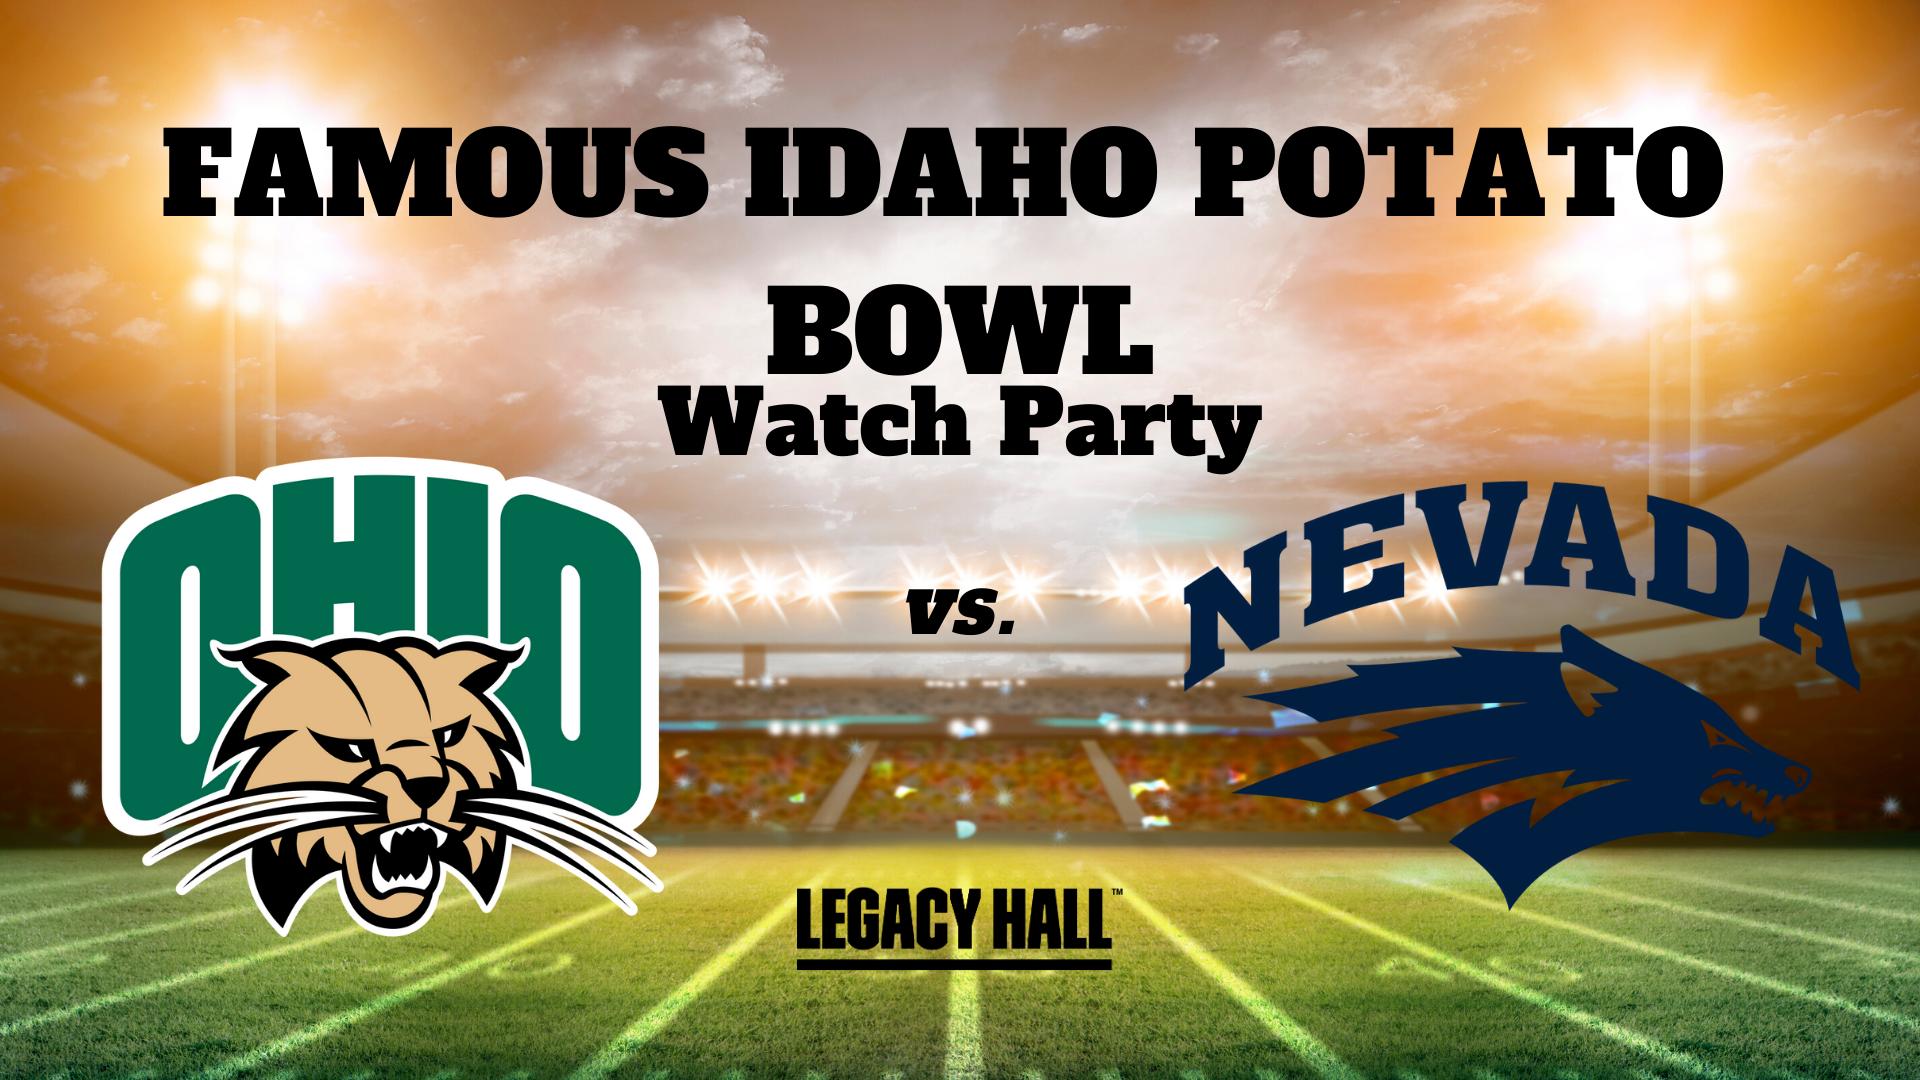 Famous Idaho Potato Bowl Game Watch Party - hero